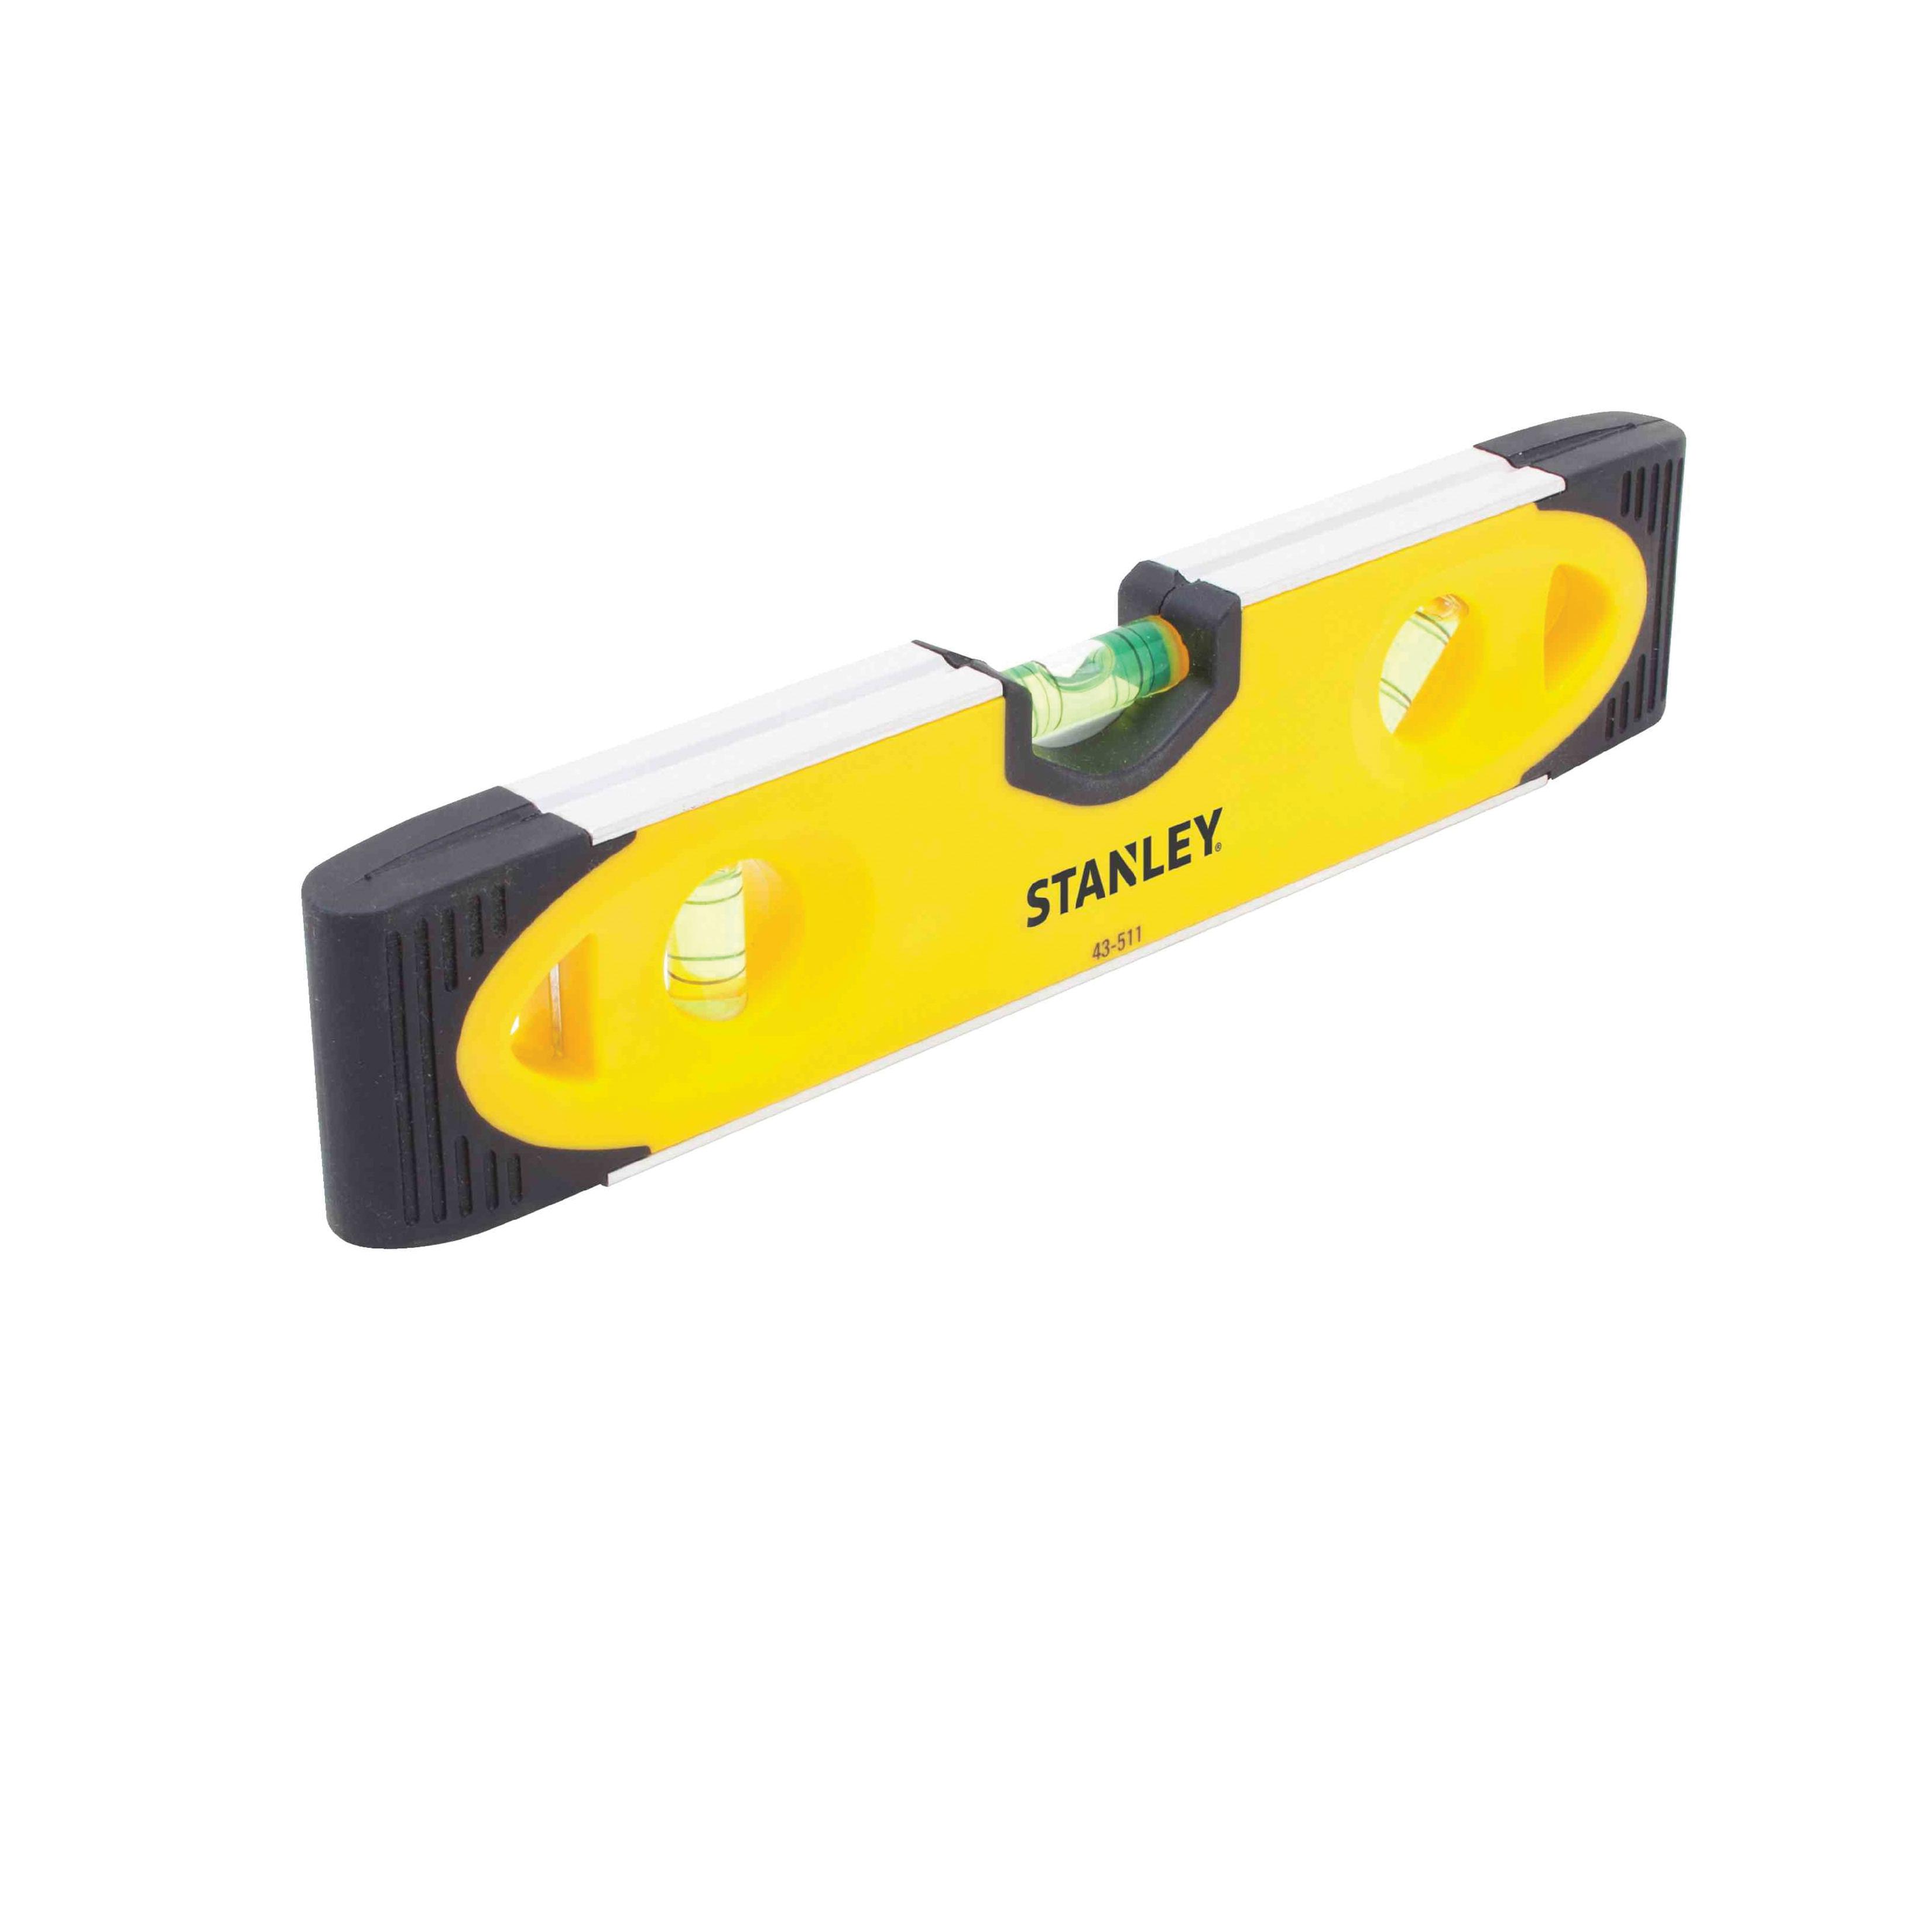 Stanley® 43-511 Magnetic Shock Resistant Torpedo Level, 9 in L, 3 Vials, (1) Level, (2) Plumb Vial Position, Aluminum